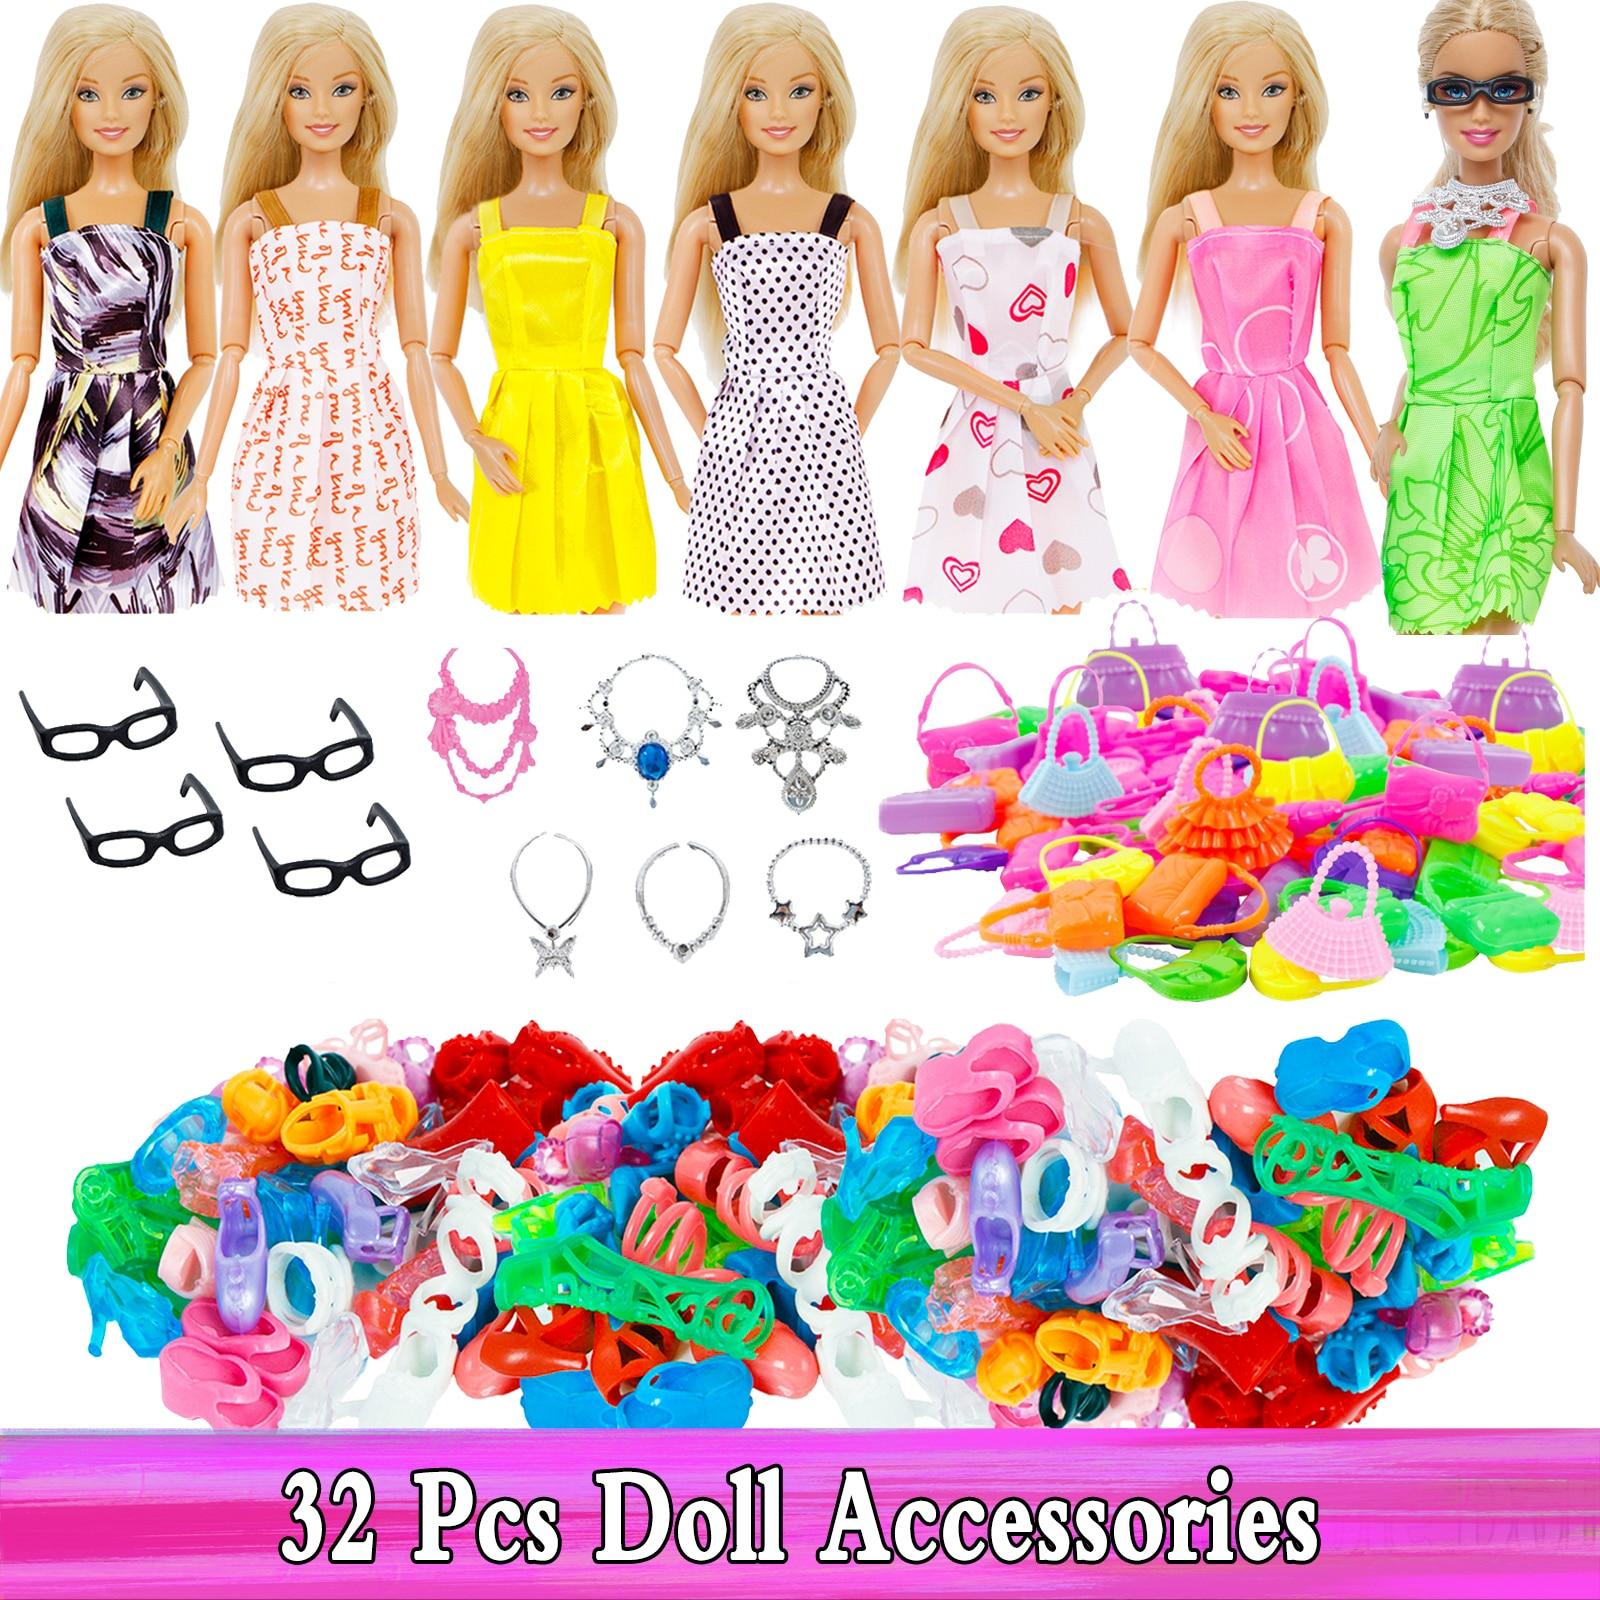 Random 32 Pcs = 10x Mixed Style Mini Dress + 10x Shoes + 6x Necklace + 4x Glasses + 2x Plastic Bags For Barbie Doll Accessories